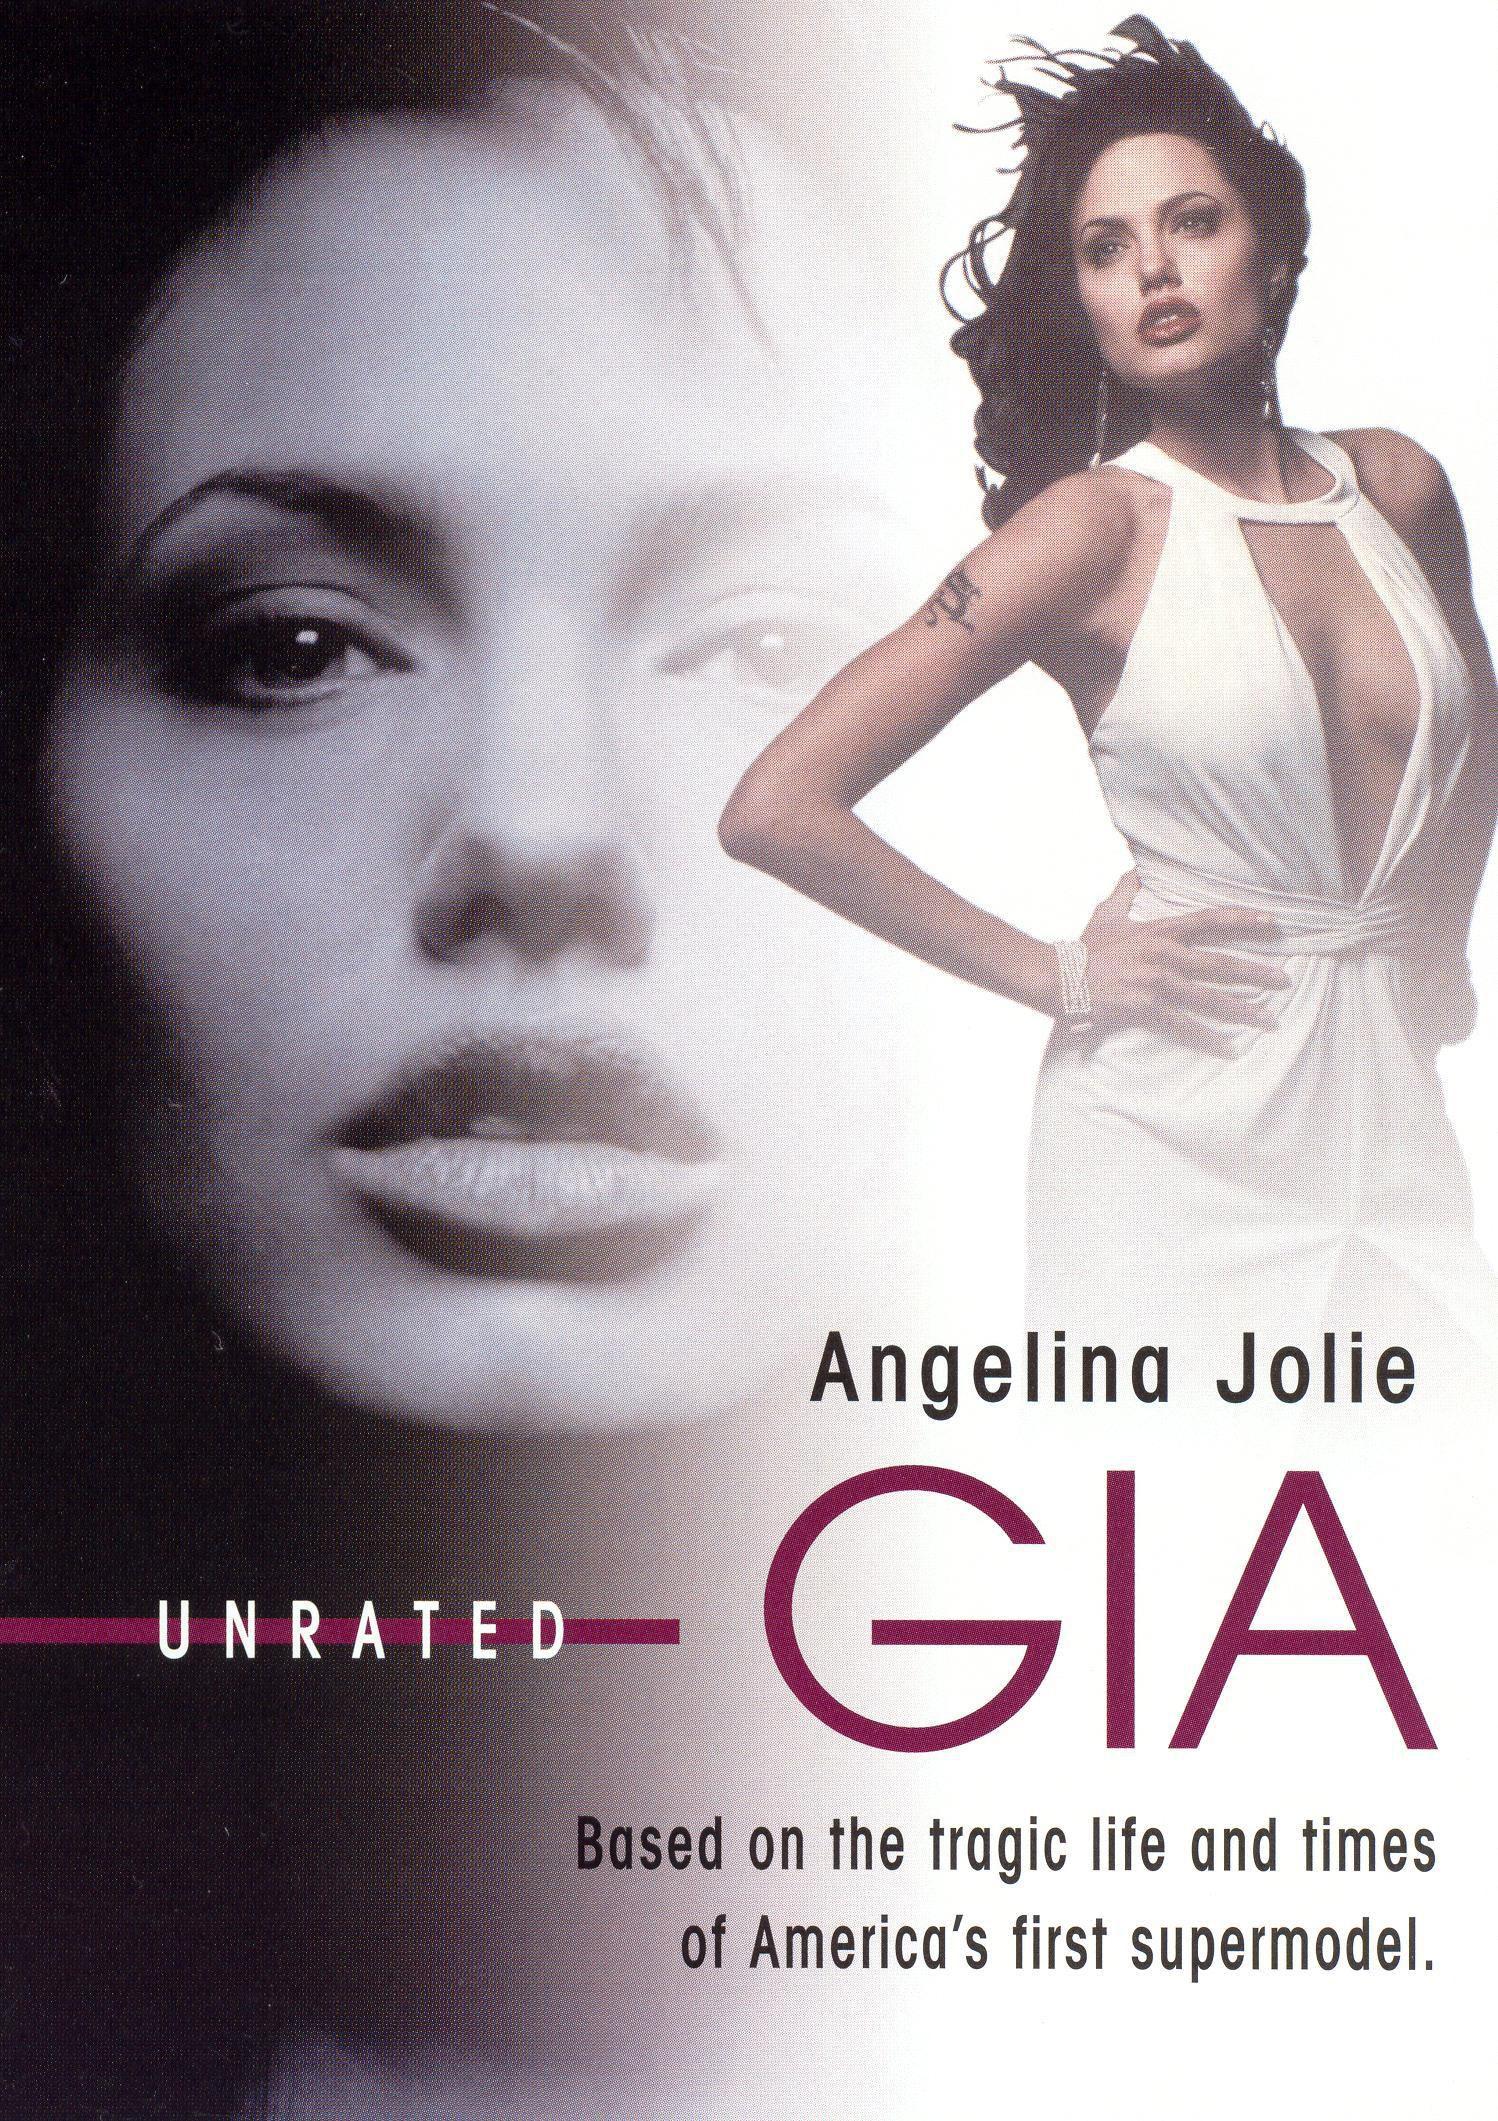 Top 10 Angelina Jolie Movies